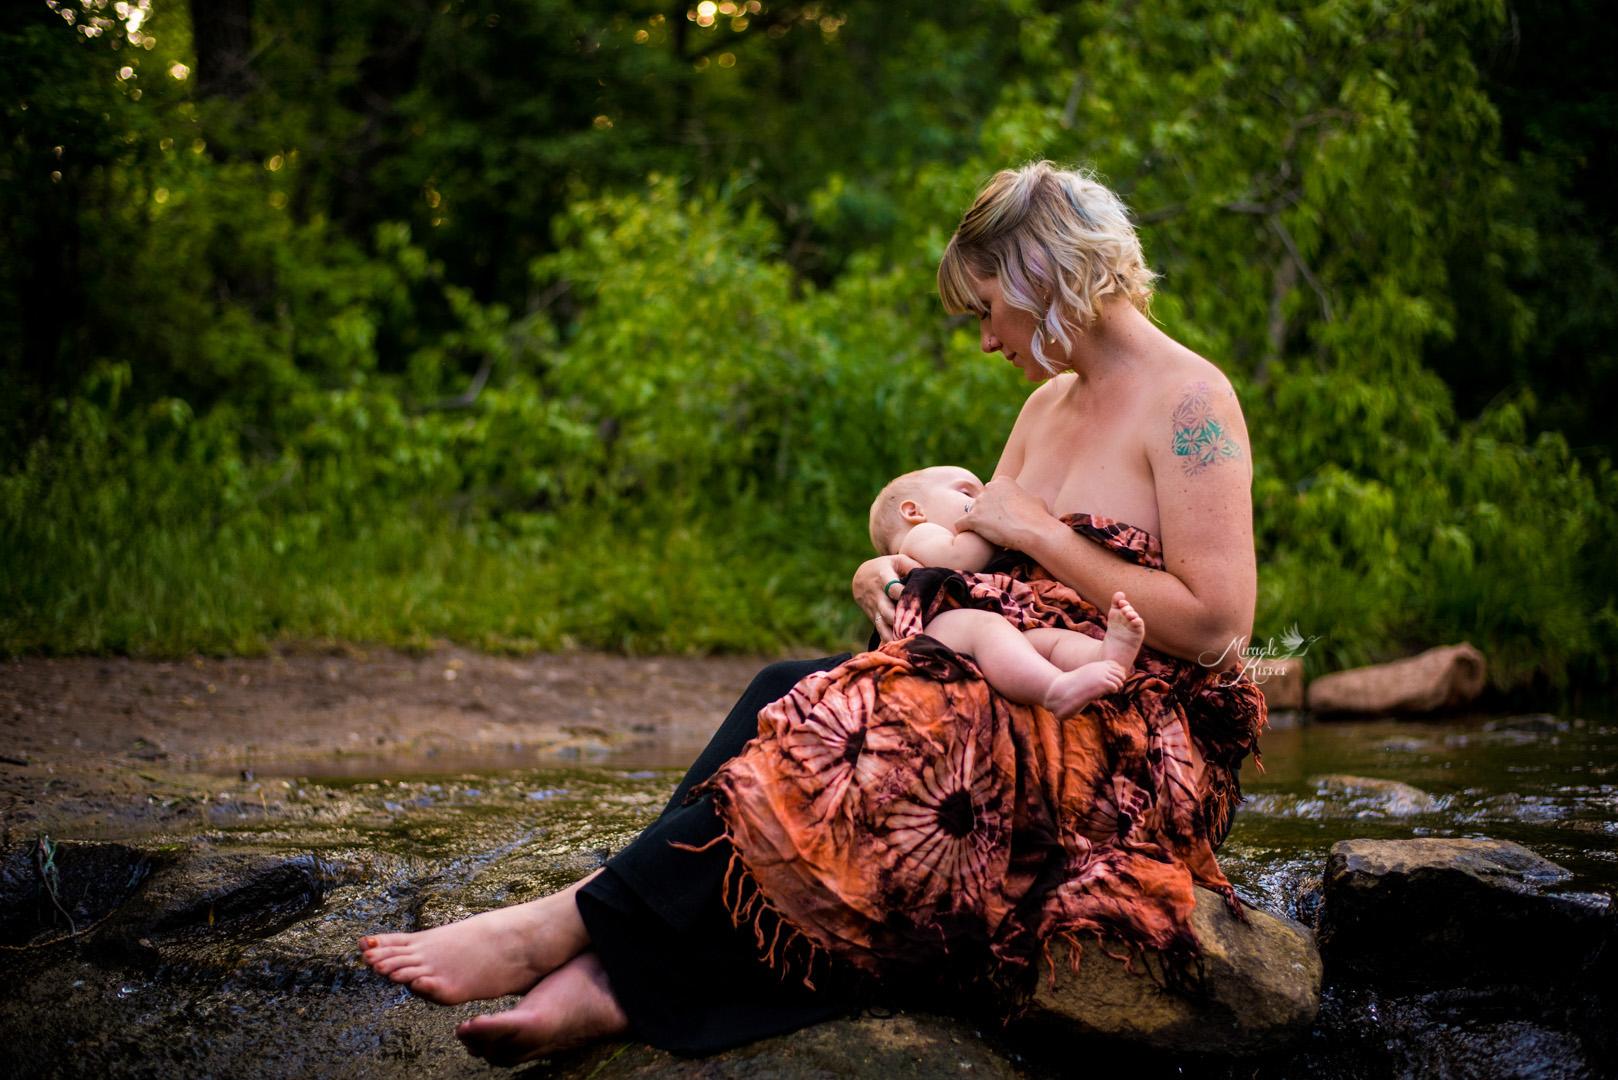 outdoor motherhood photo session, 31 days 31 stories, breastfeeding photo